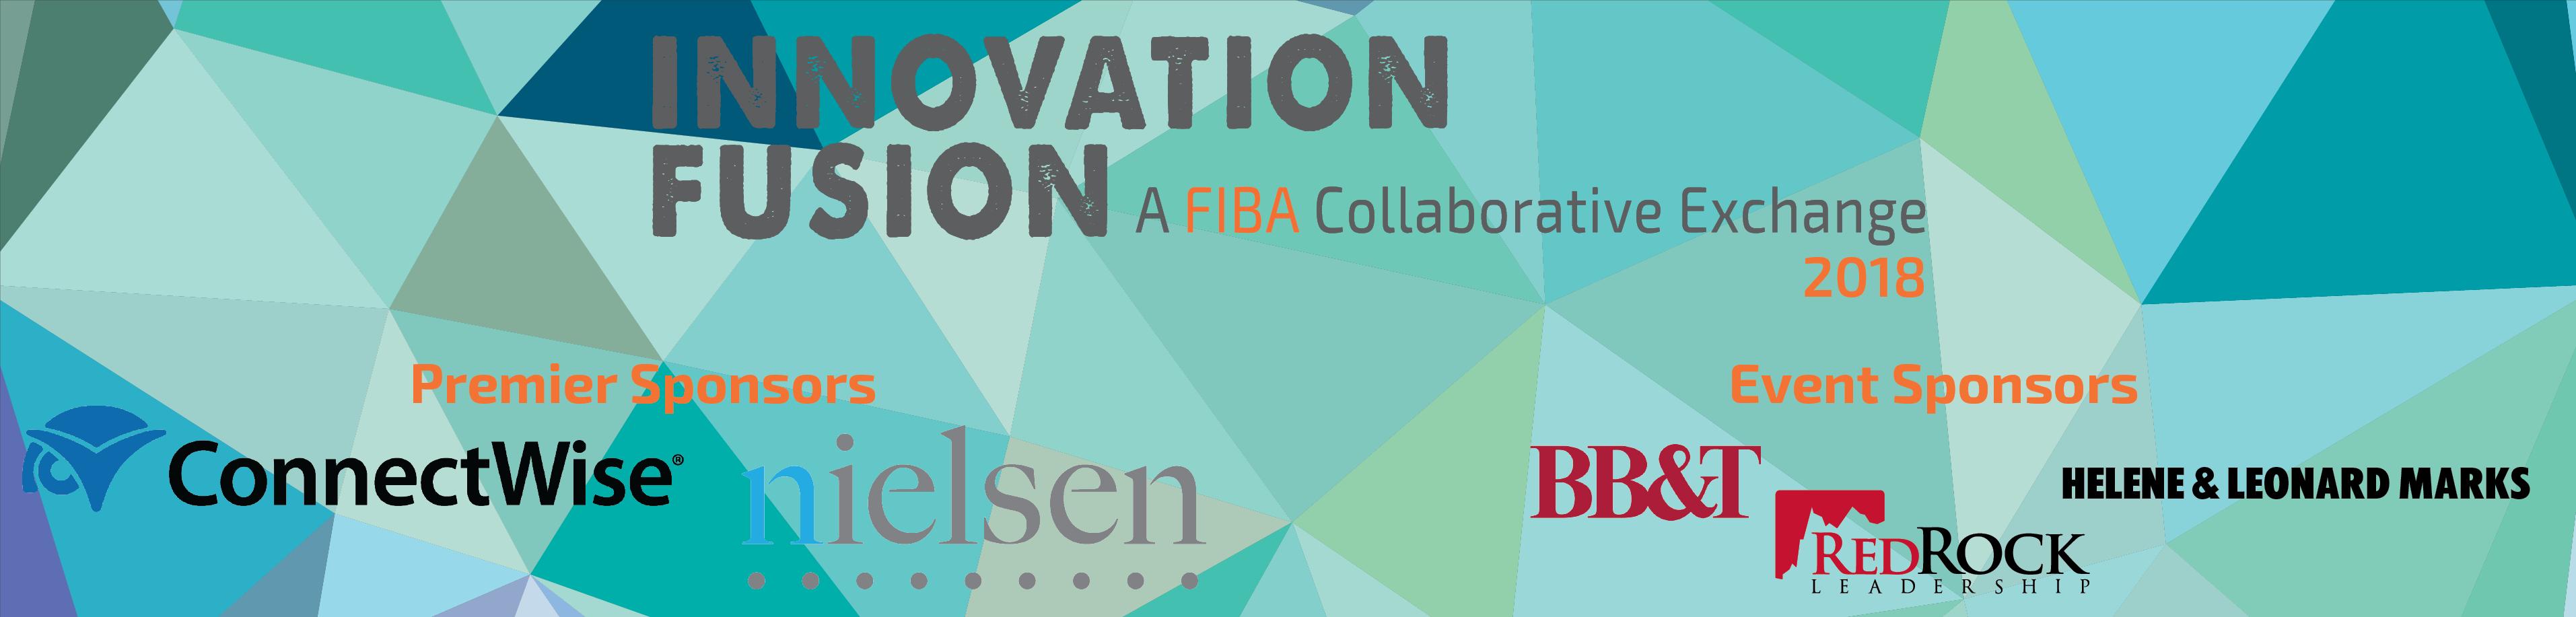 Innovation Fusion 2018 Sponsors